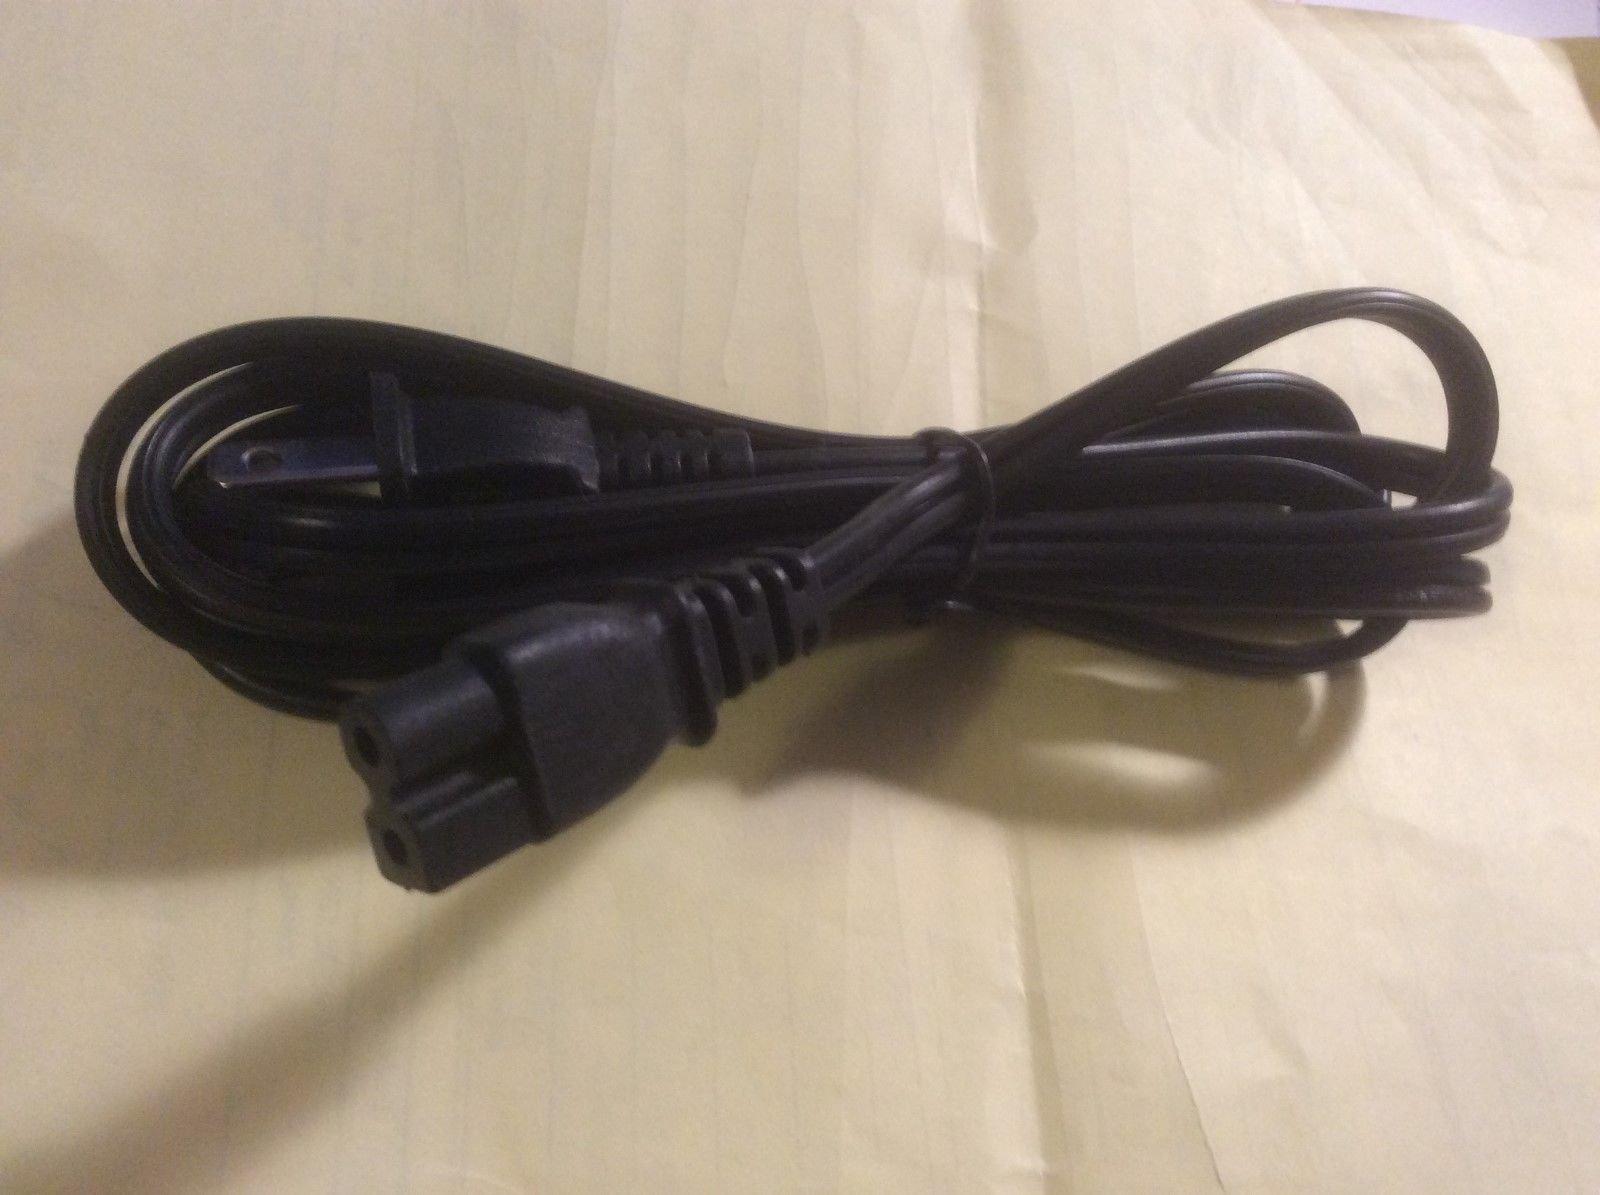 Husqvarna Viking Power Cord - Topaz